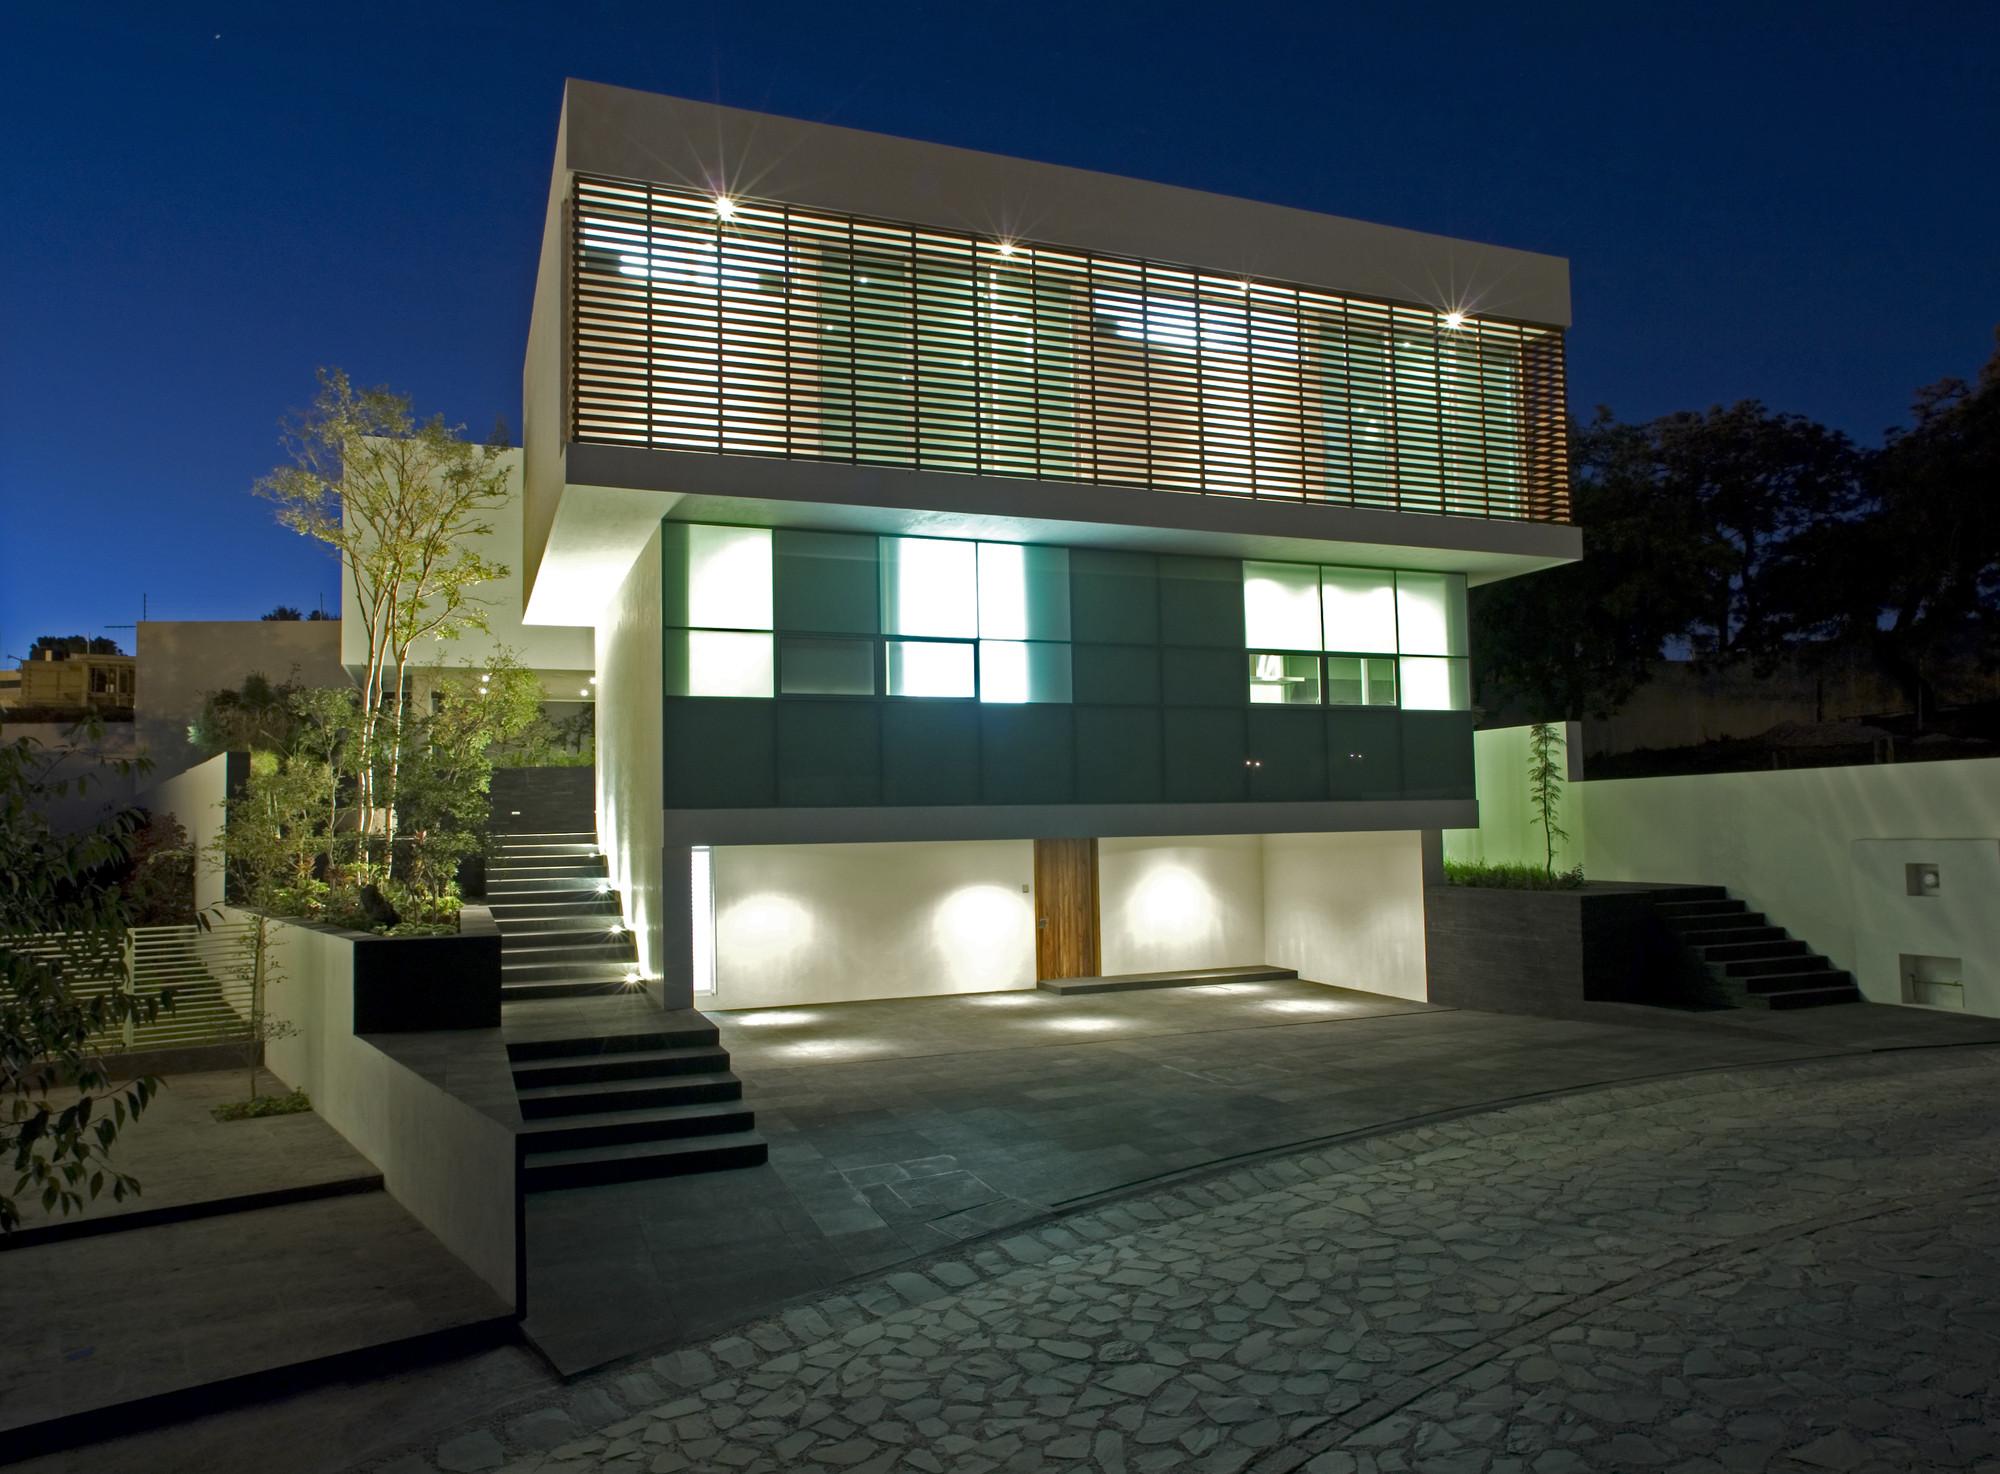 Casa EM / TaAG Arquitectura, © Jorge Silva